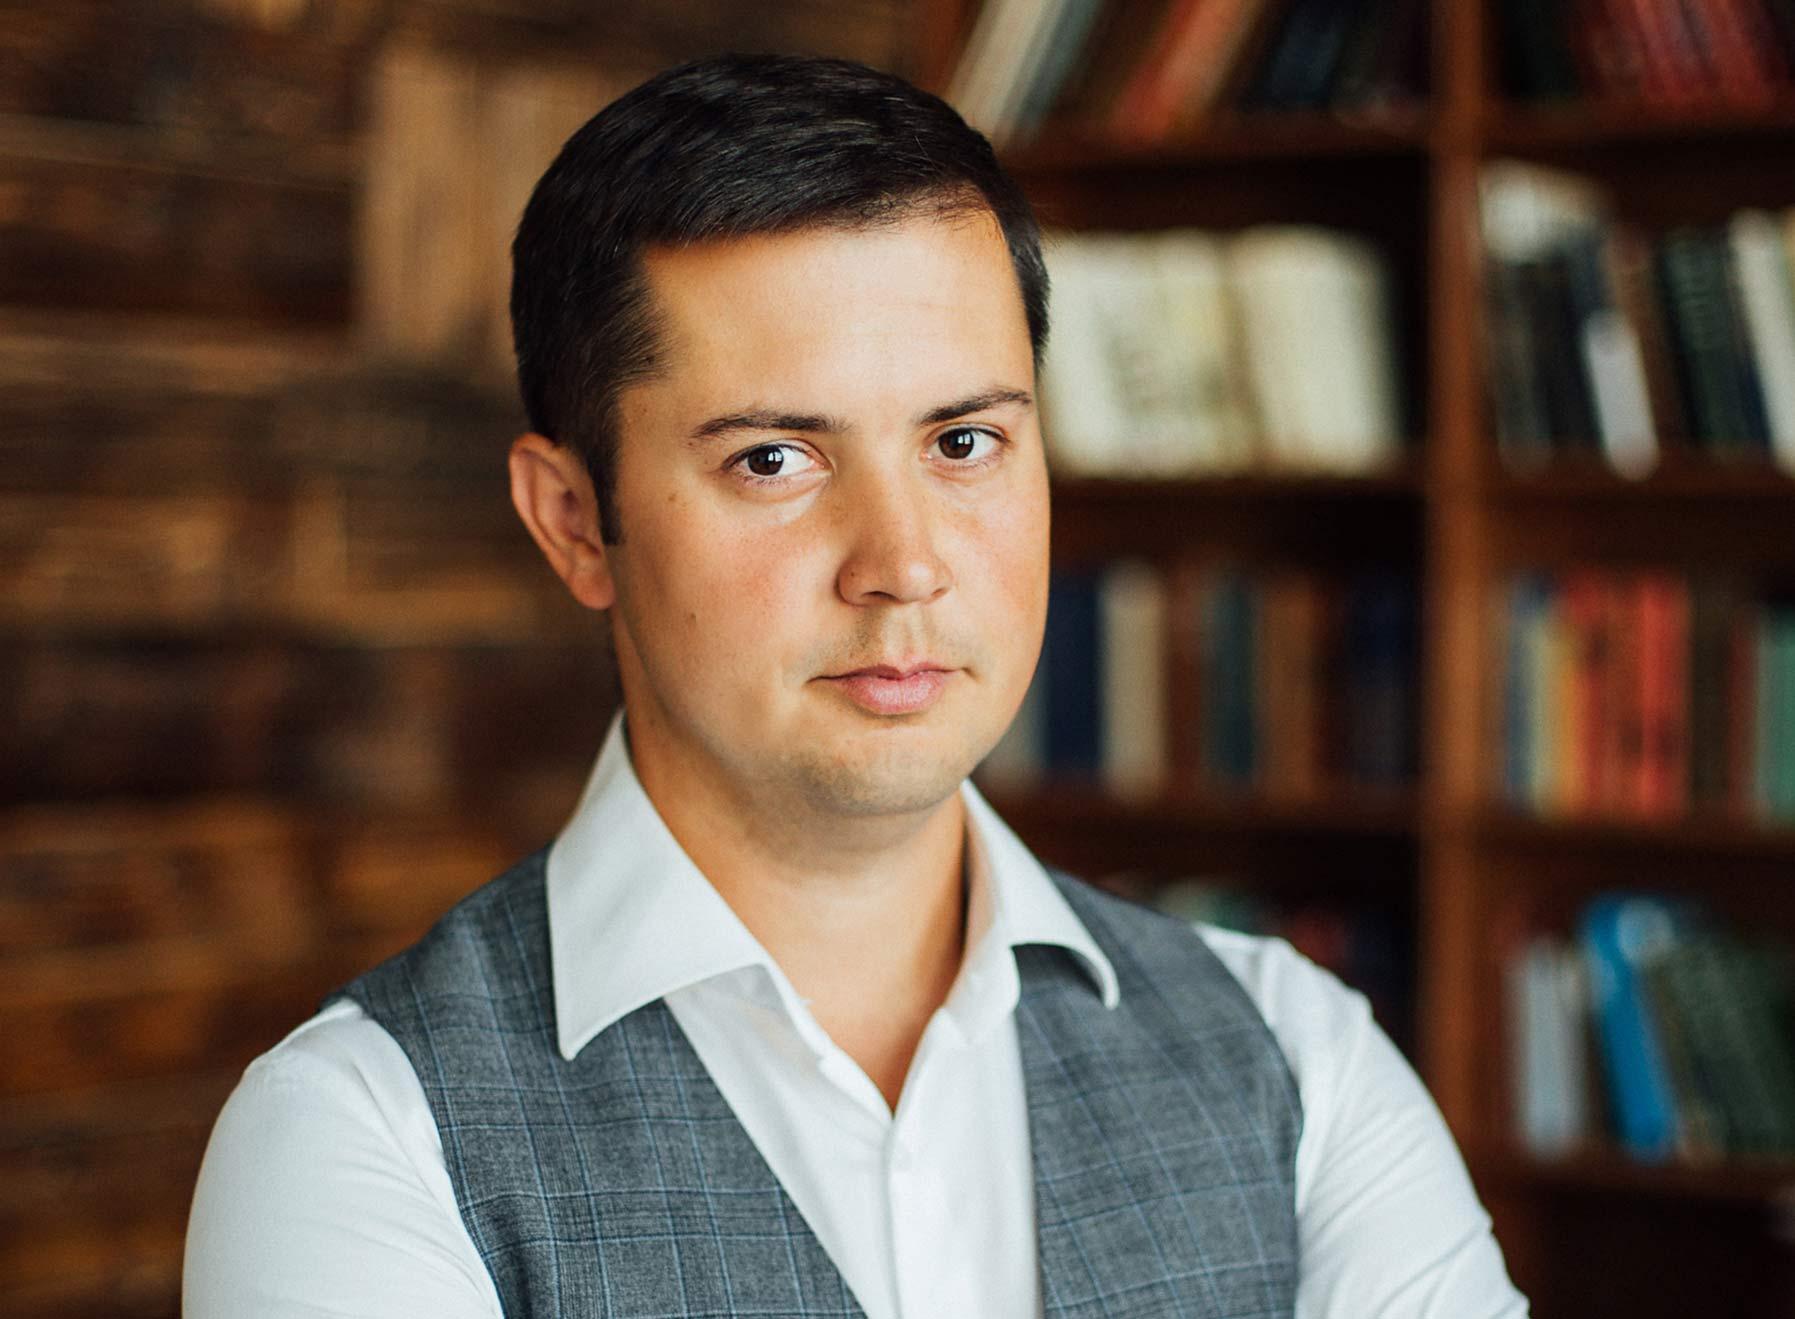 Александр Казённов, руководитель корпоративной практики ДКИС ALP Group